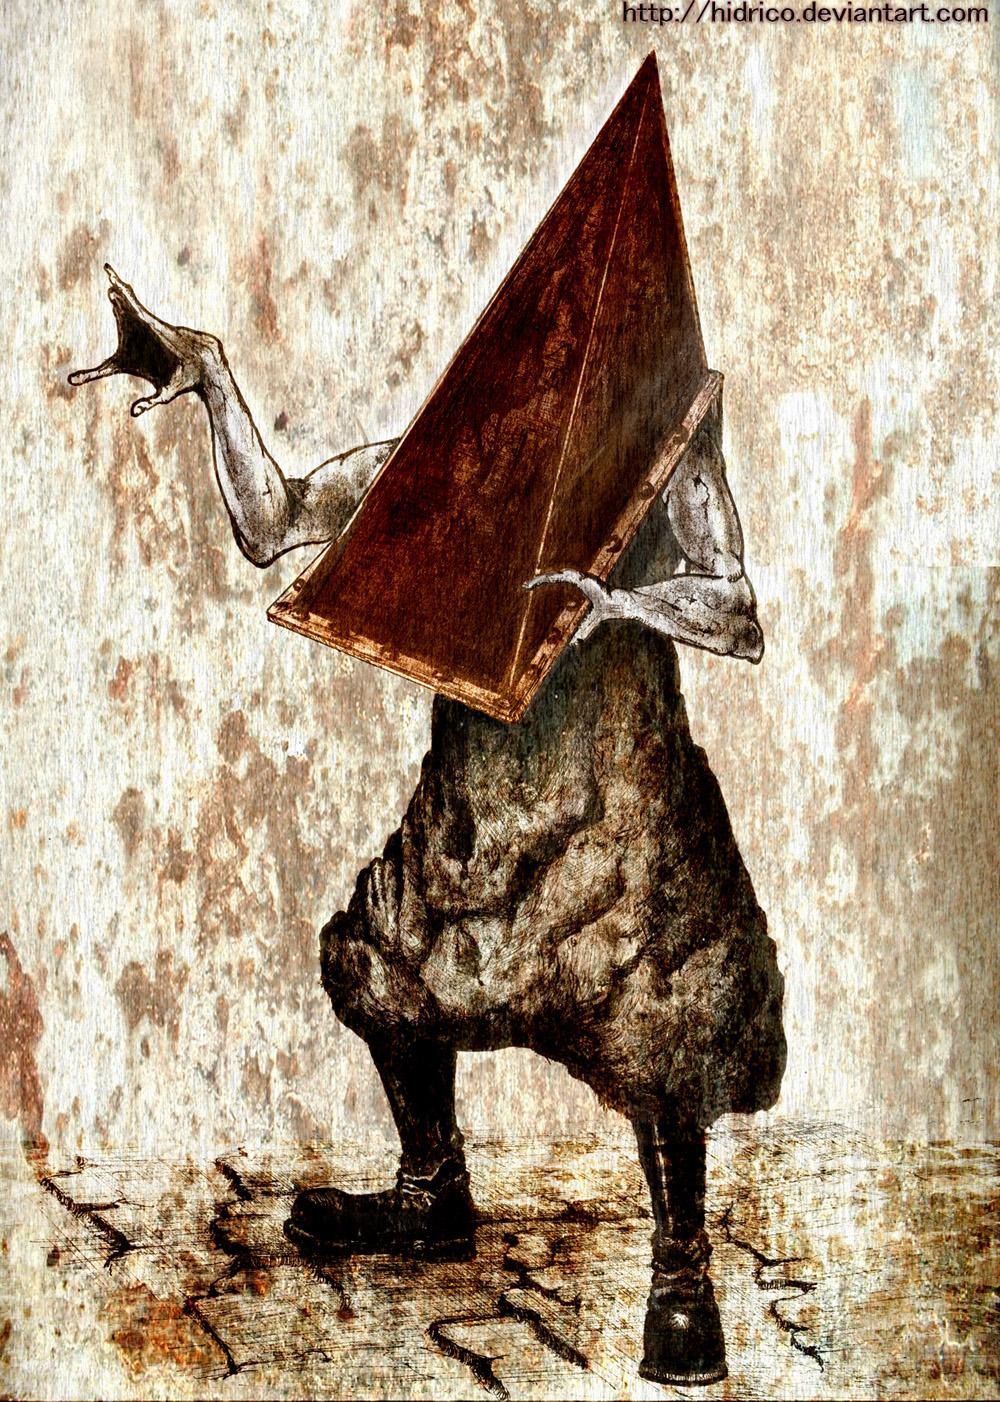 Pyramid Head Silent Hill 2 by Hidrico